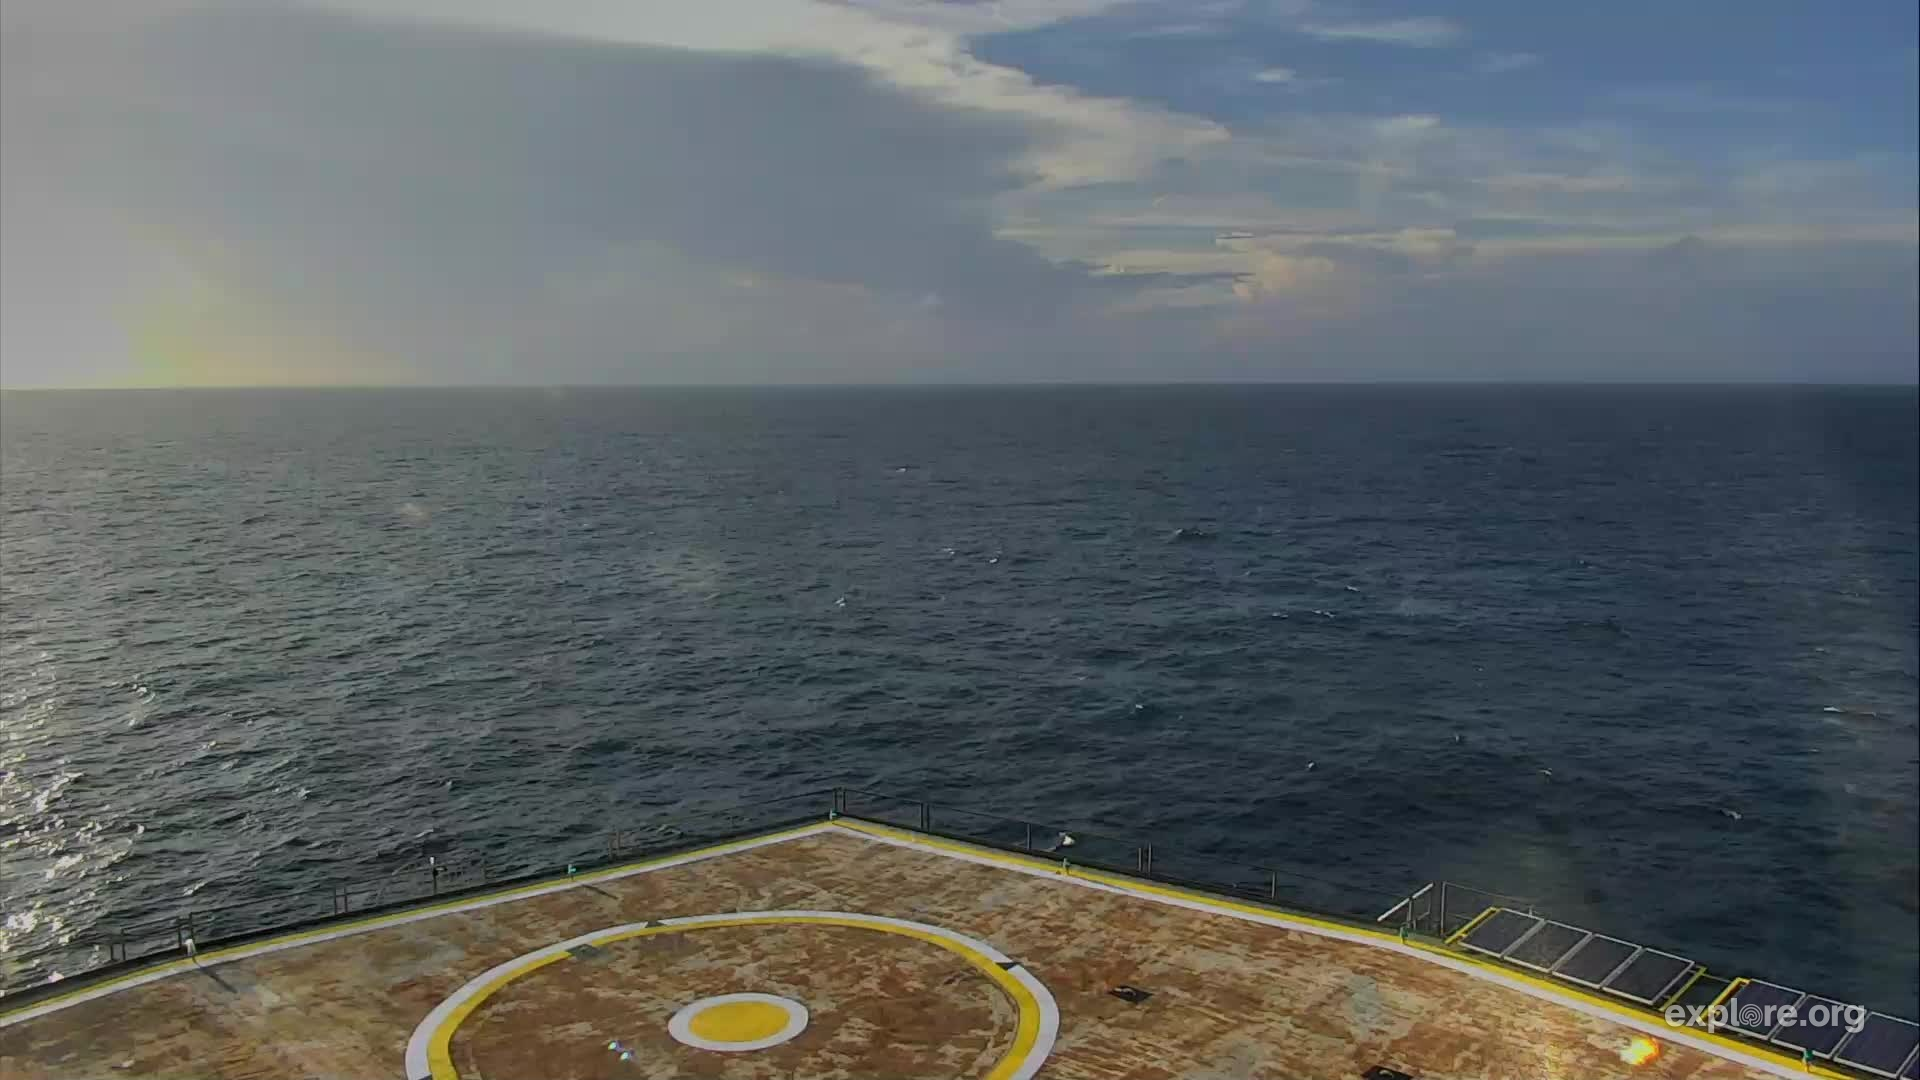 Frying Pan Tower Ocean View Snapshots Explore Org